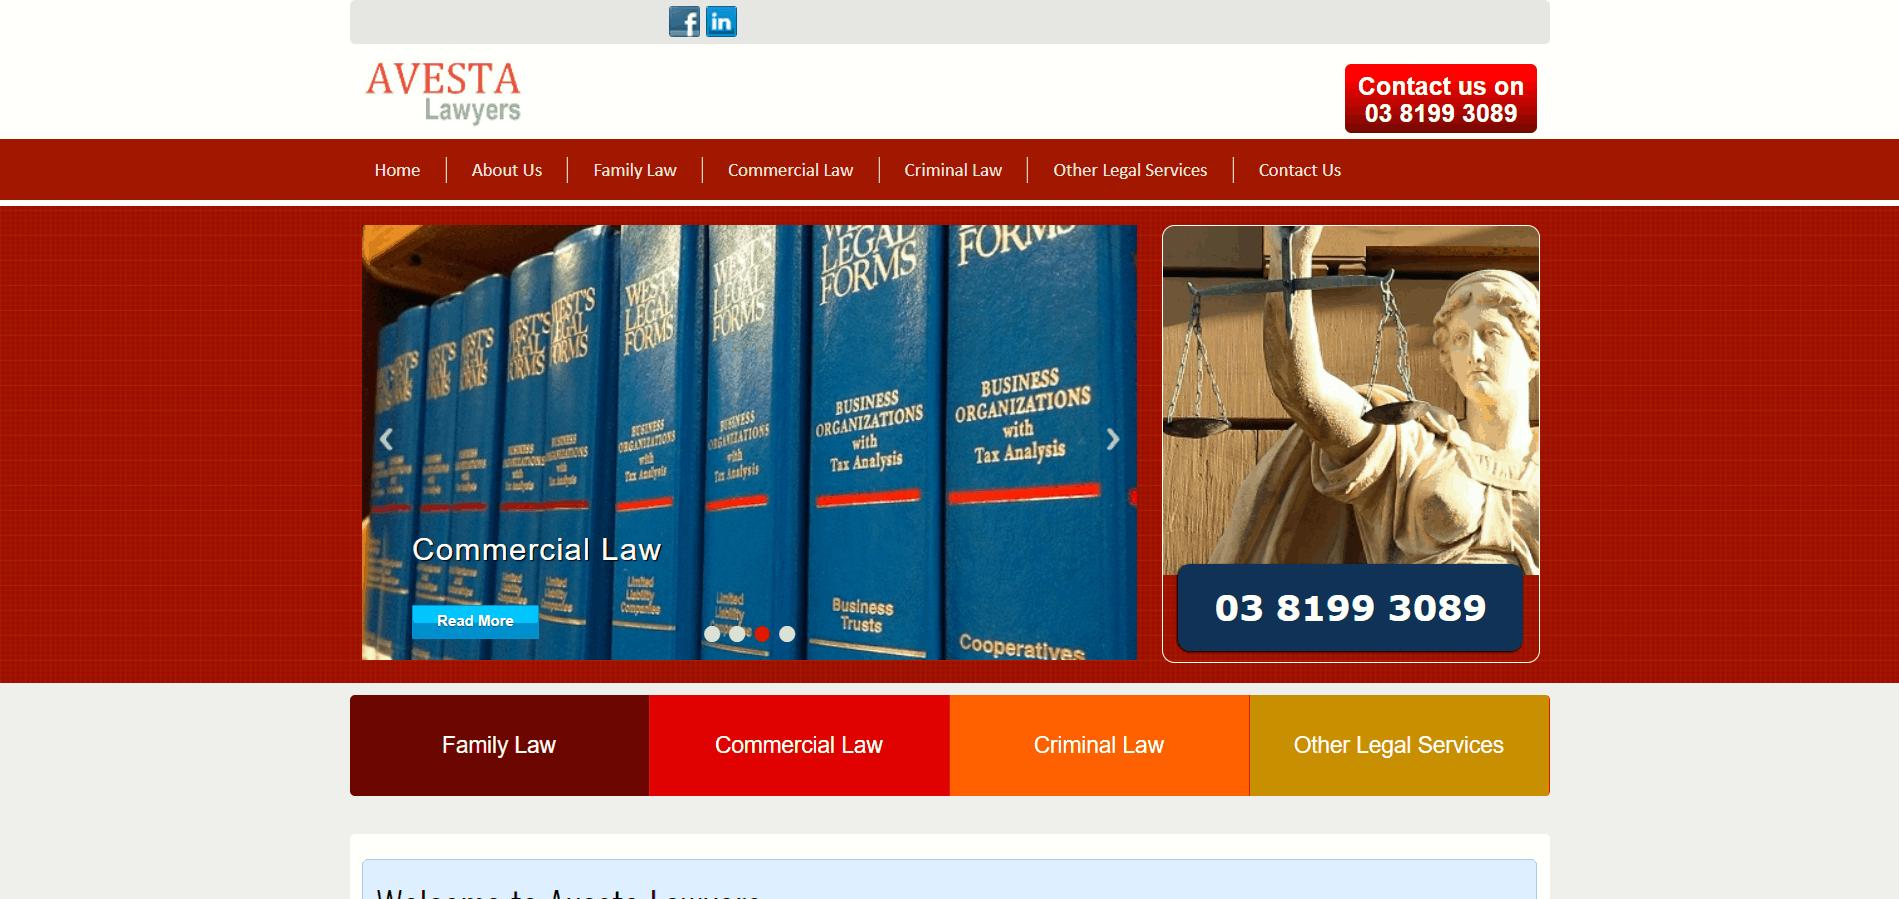 Avesta Lawyers